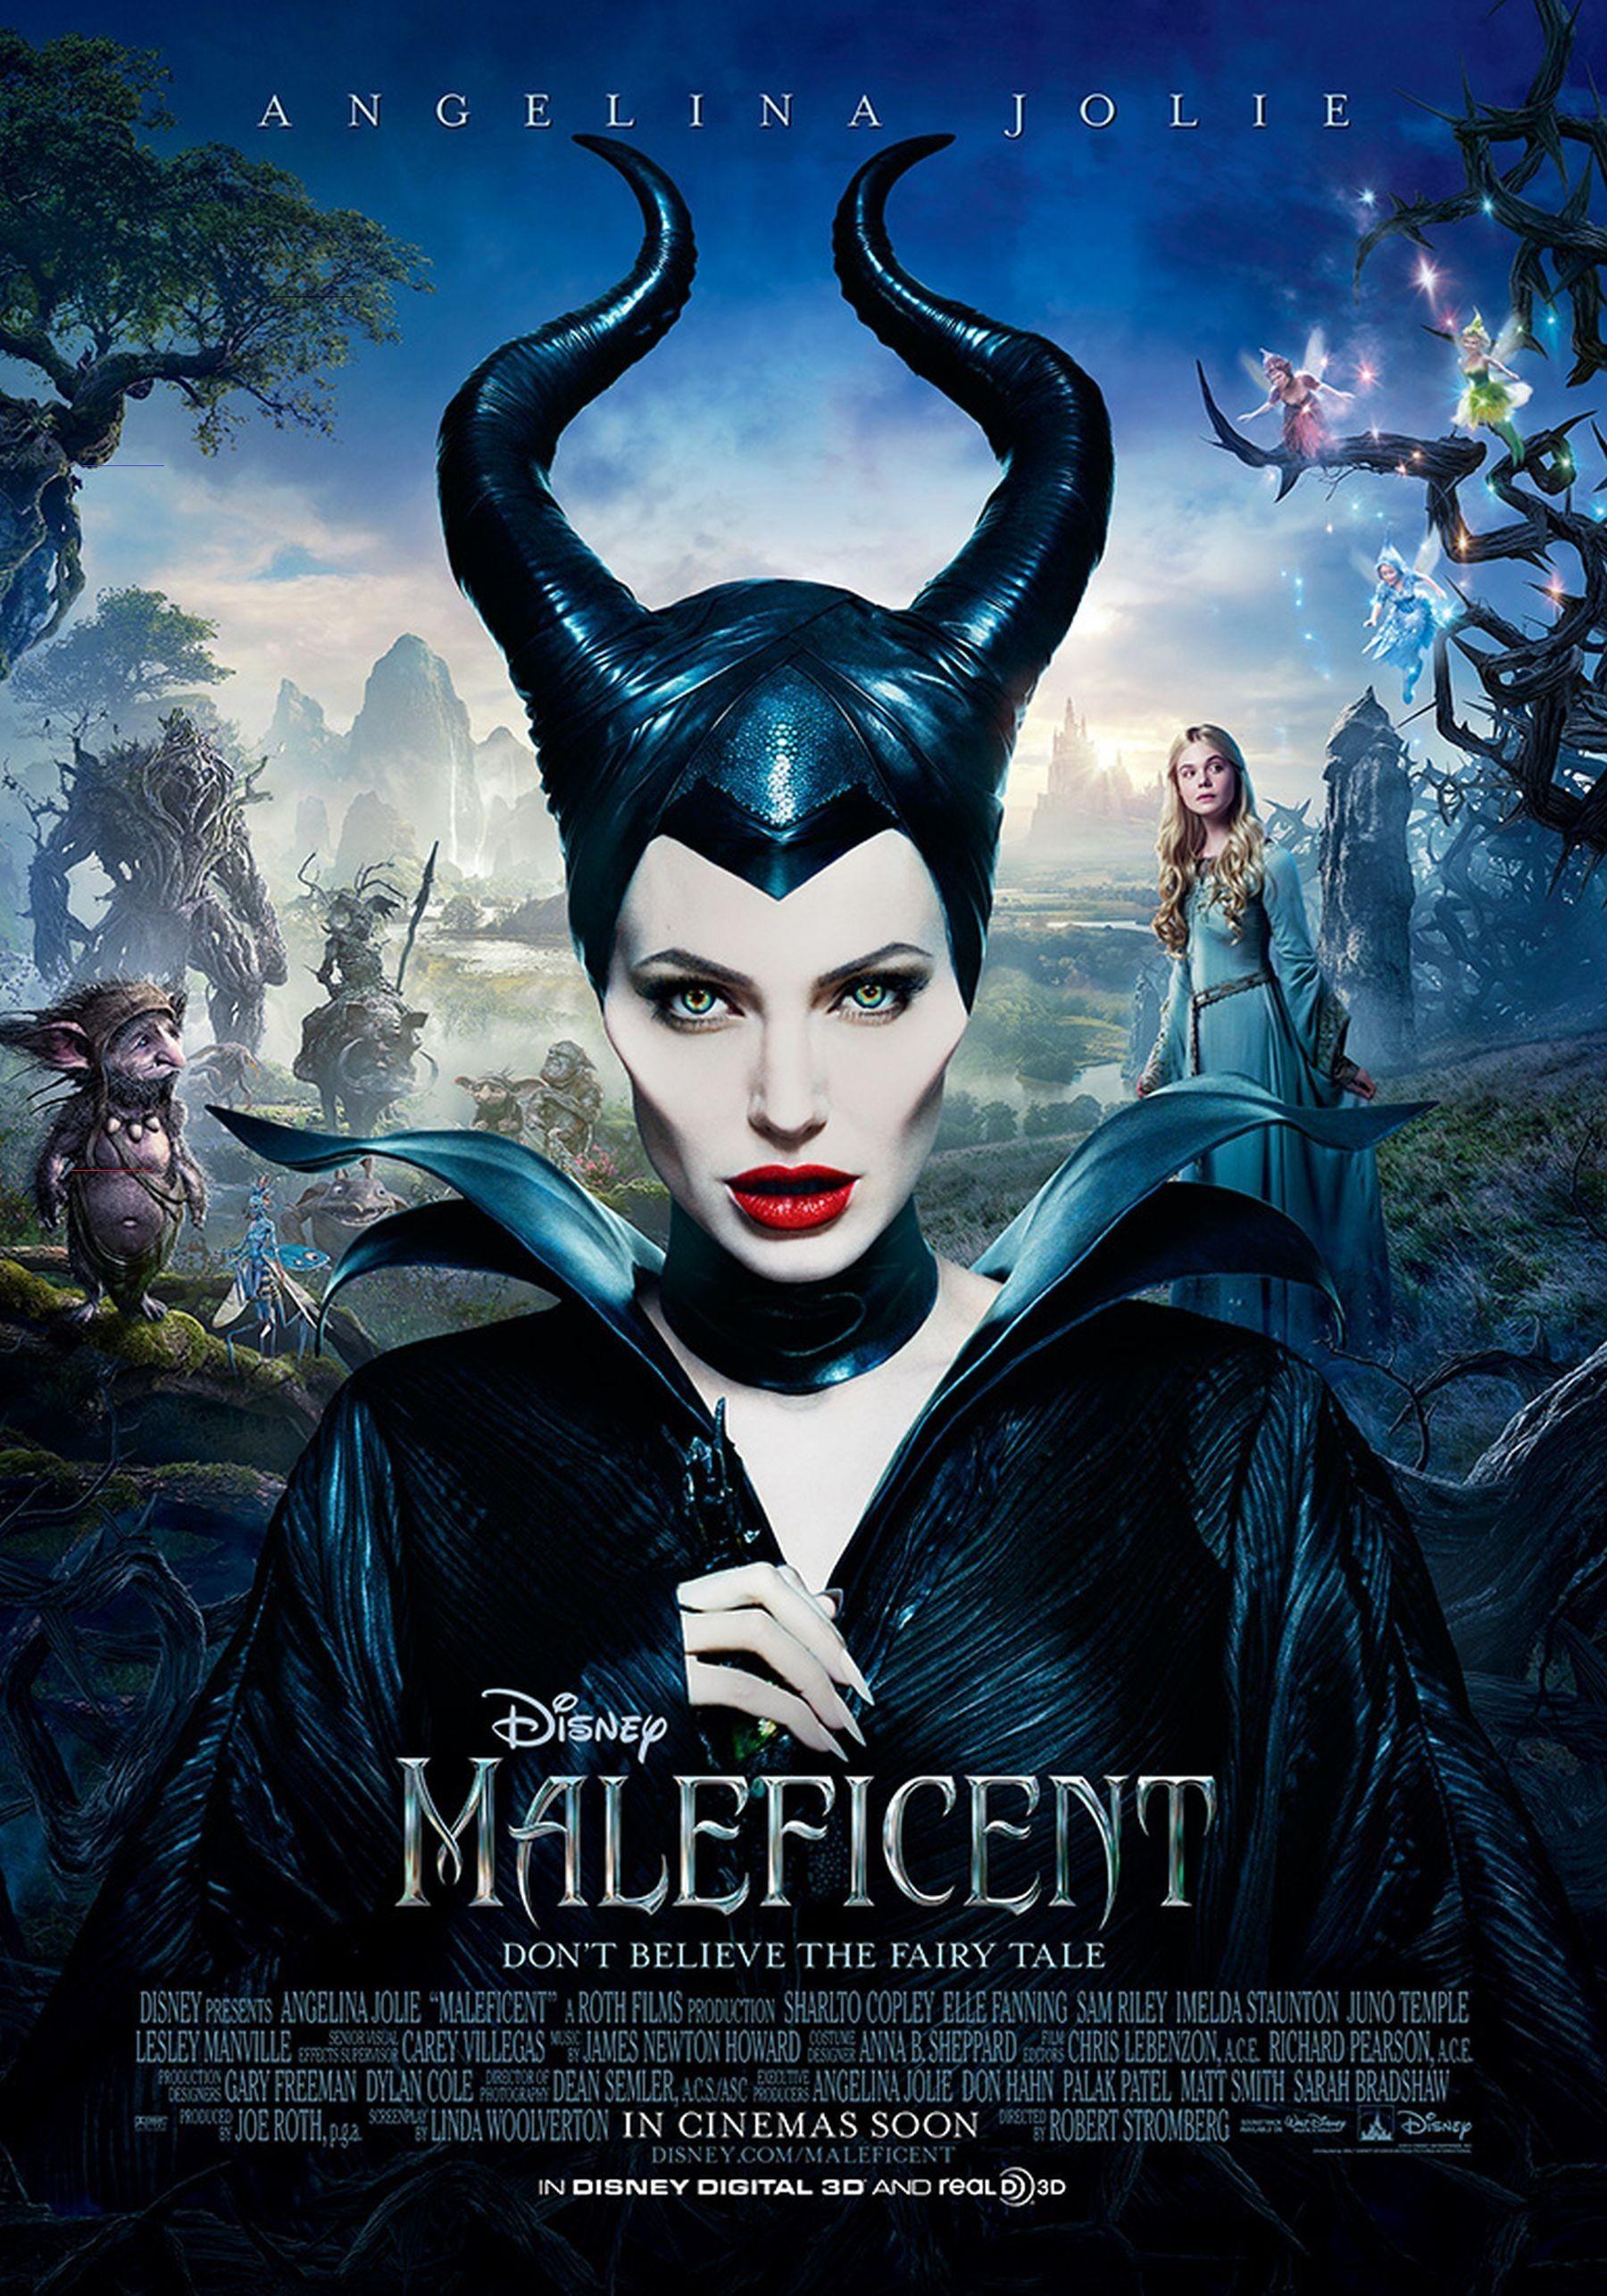 Maleficent Film Disneymovies Maleficent Is A 2014 American Dark Fantasy Film Directed By Robert Stromberg An Fantasy Filme Disney Animation Disney Memes